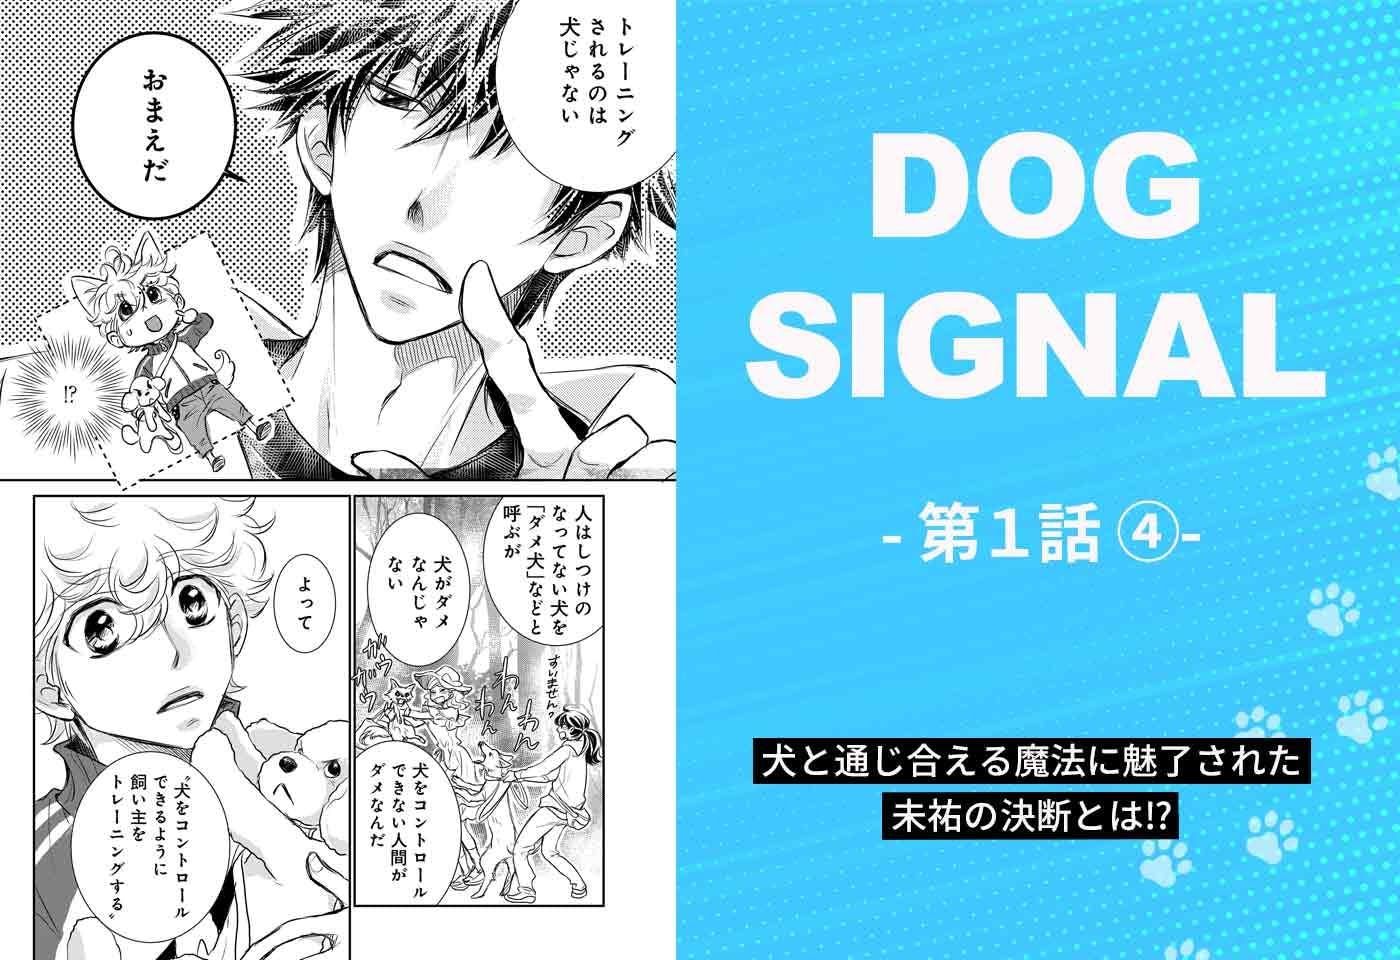 【新連載】『DOG SIGNAL』1話目 4/4